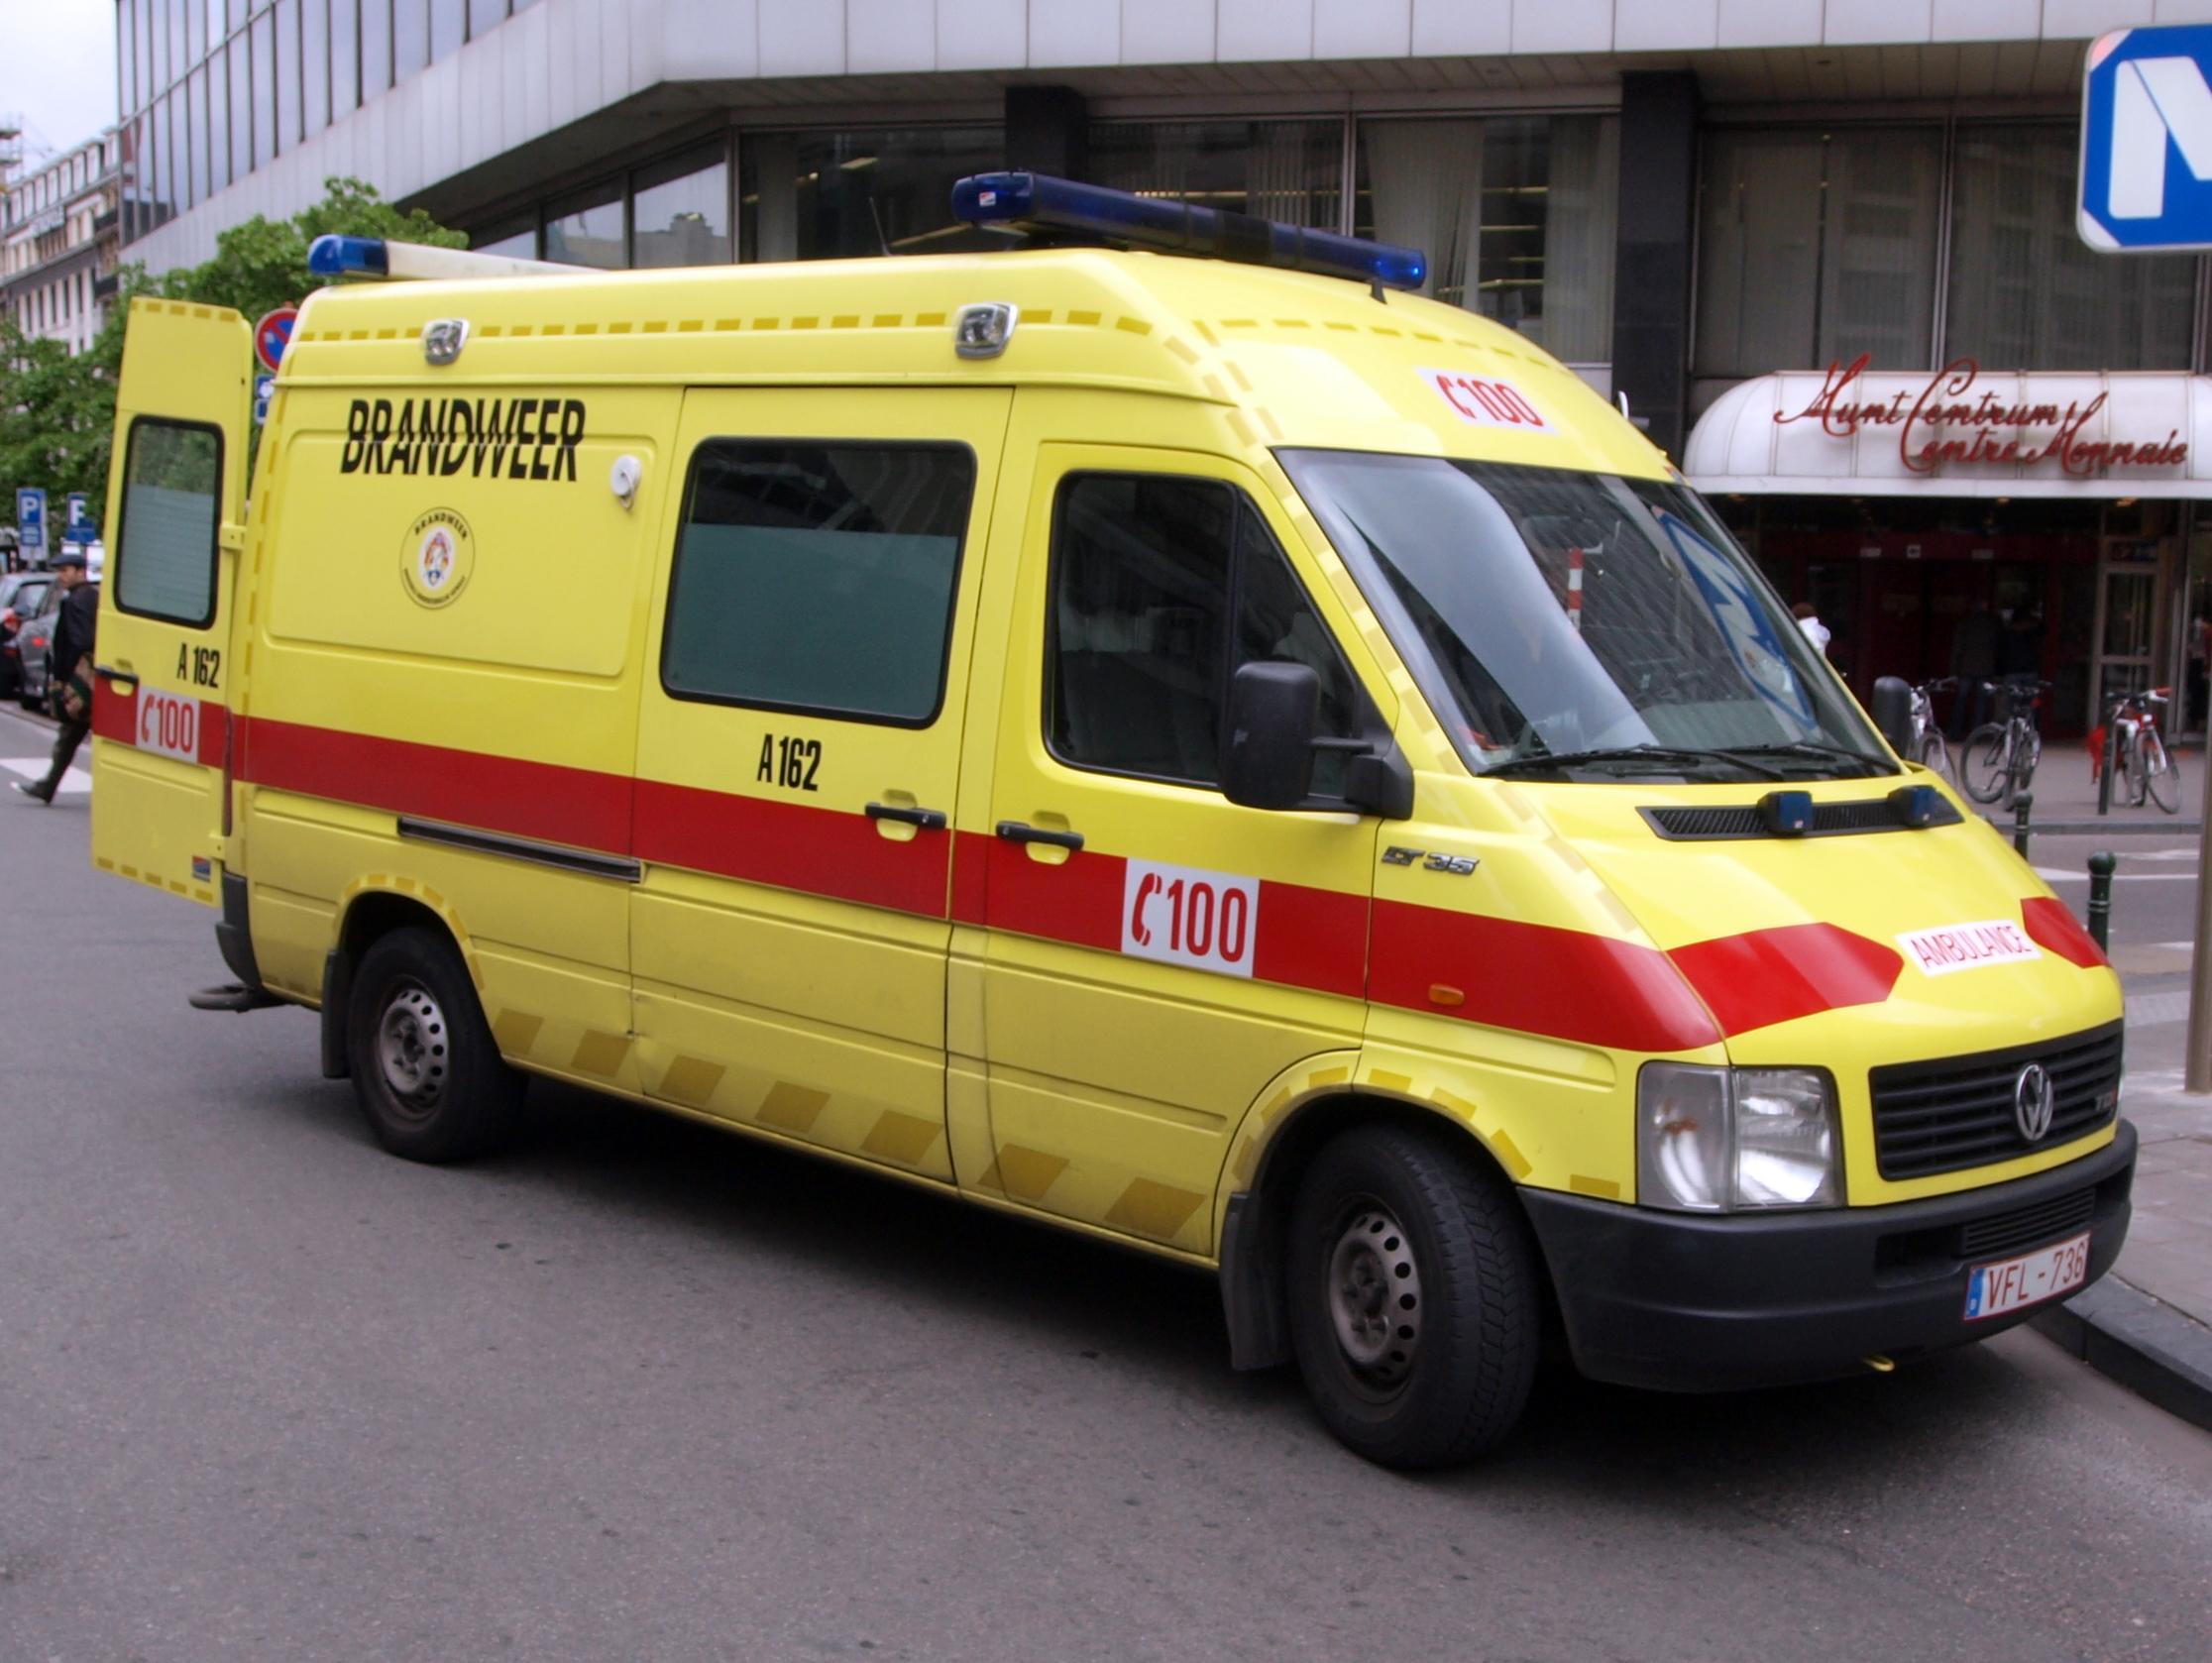 File Vw Ambulance In Bruxelles Belgium Jpg Wikimedia